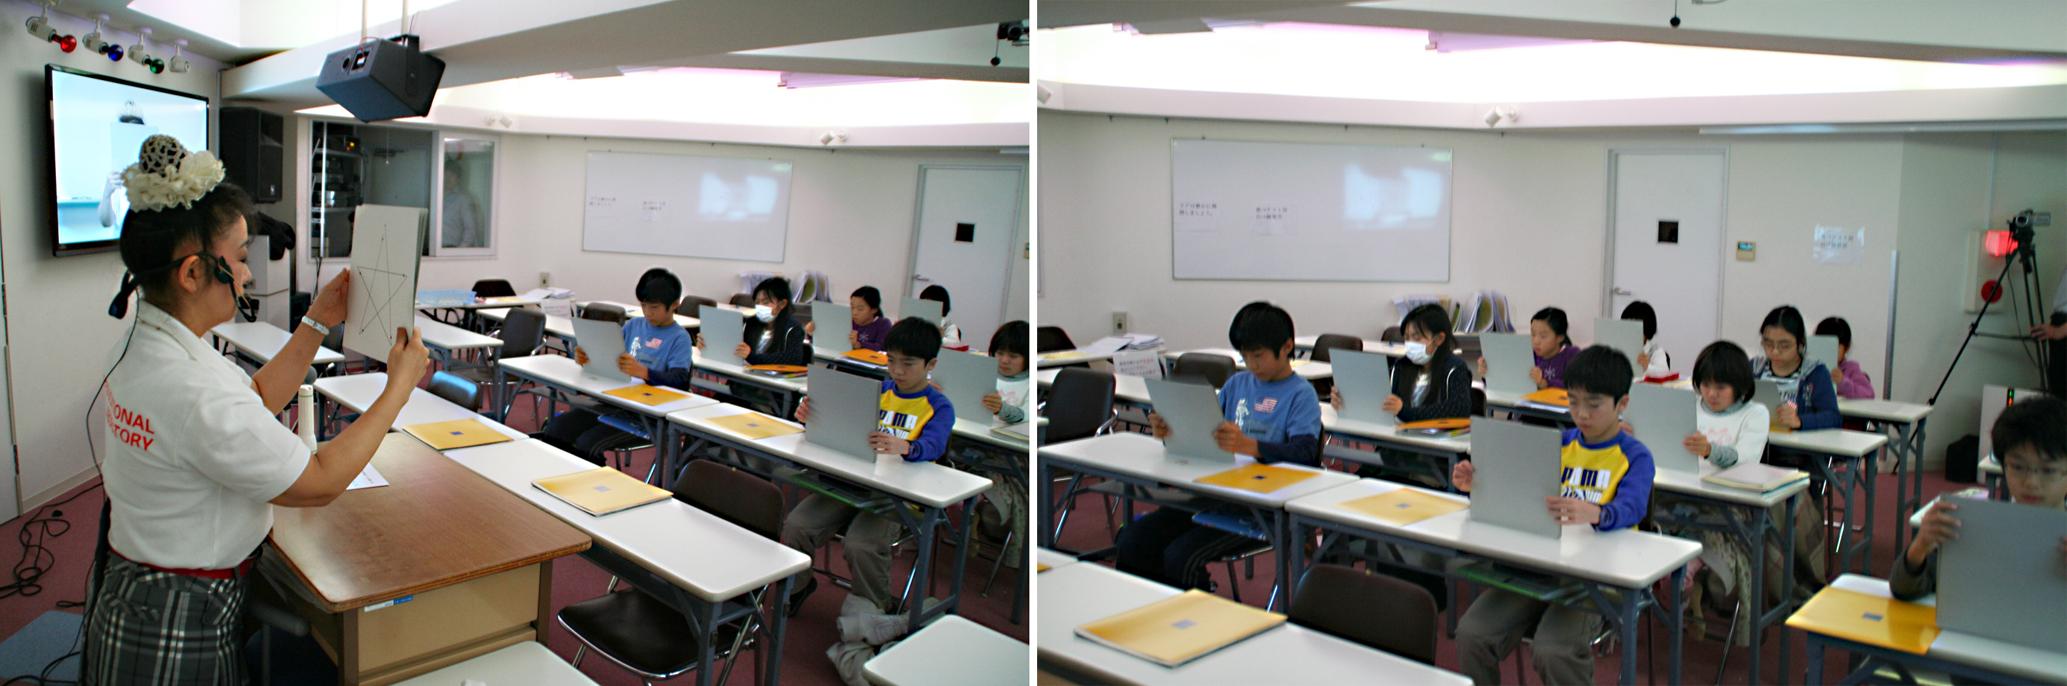 幼児教室ヘーグル 第33回1DAYPAD高速学習講座04